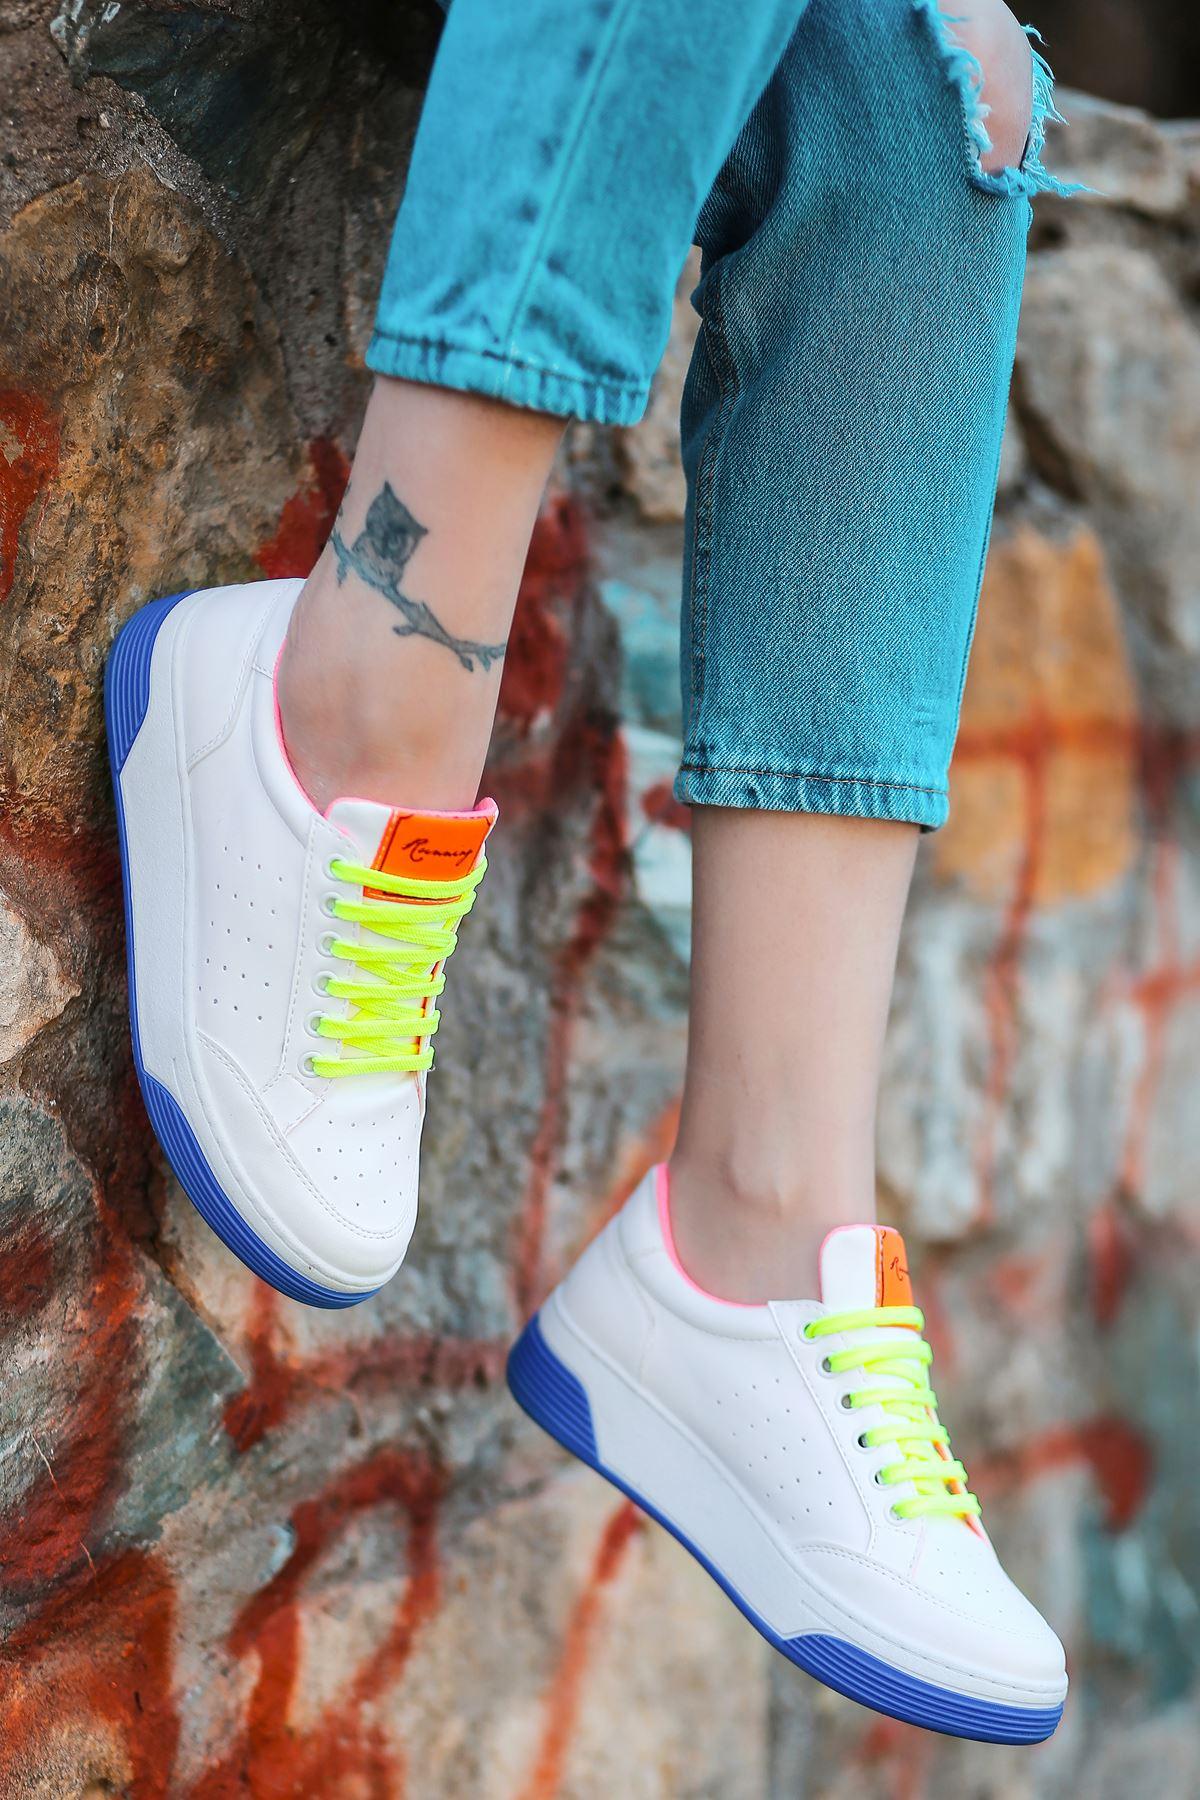 Fuzzy Mat Deri Mavi Taban Bağcık Detay Sneakers